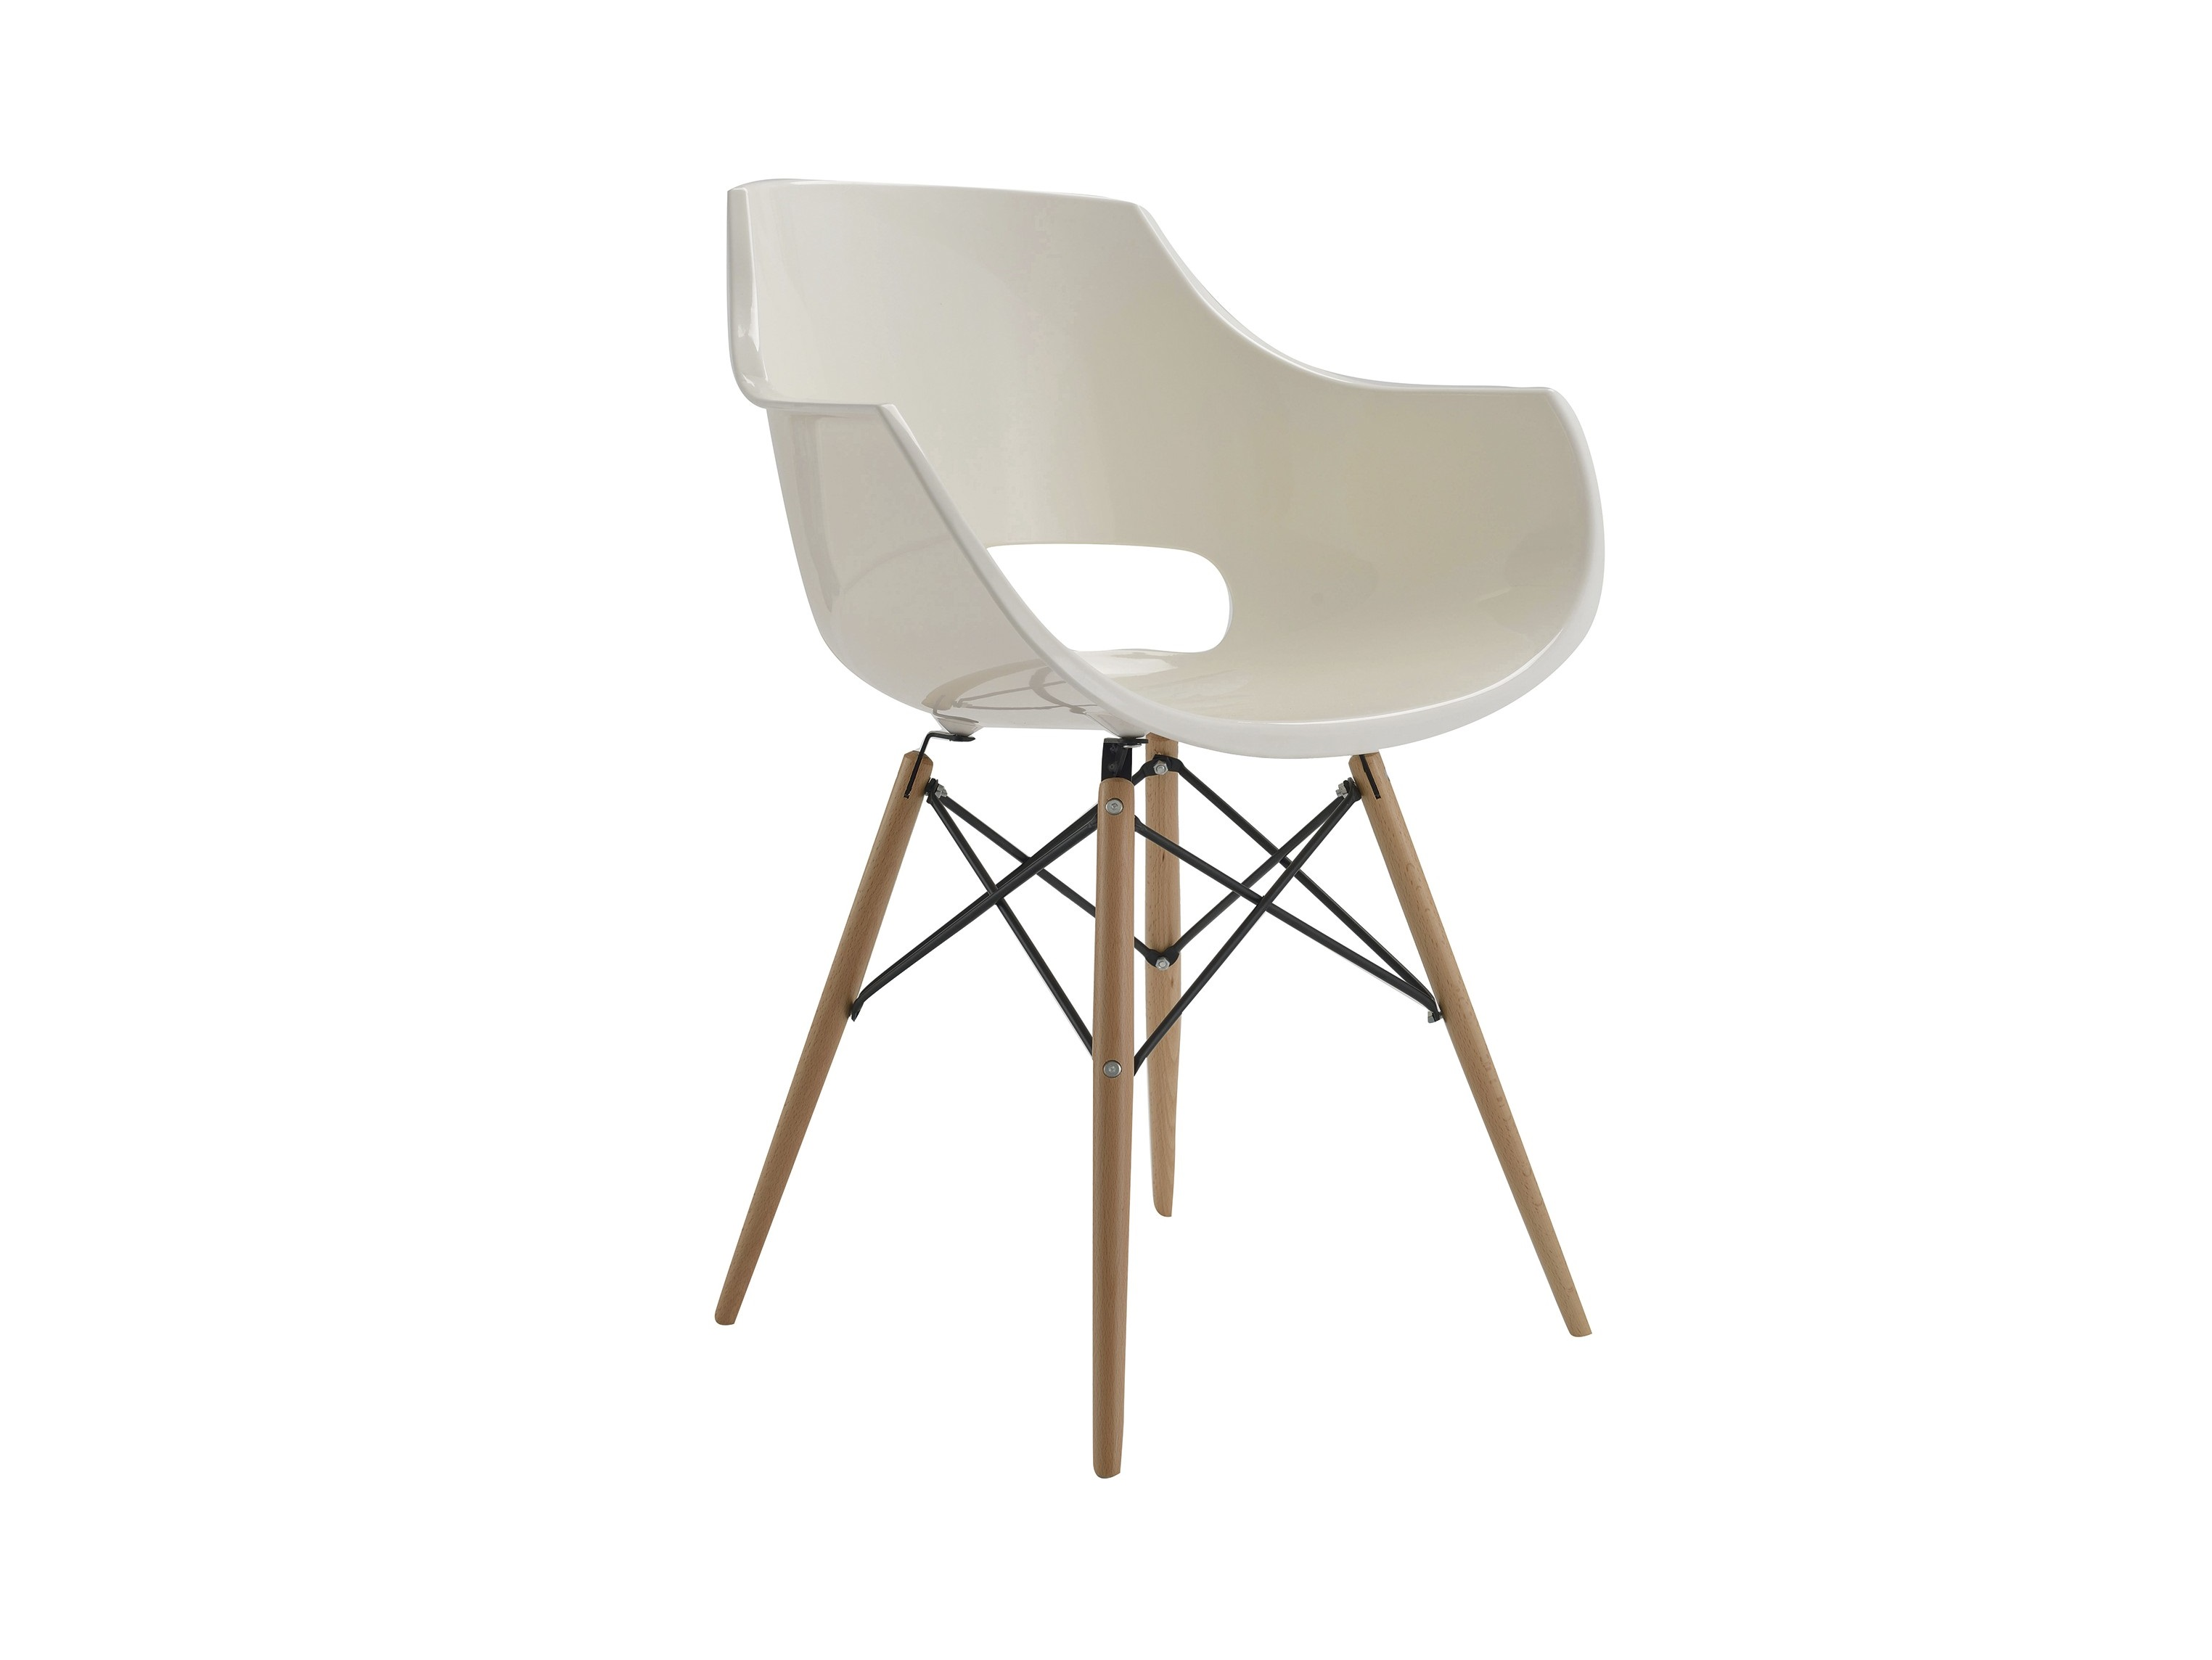 СтулОбеденные стулья<br>Материал: Пластик, дерево<br><br>Material: Пластик<br>Width см: 63<br>Depth см: 54<br>Height см: 83